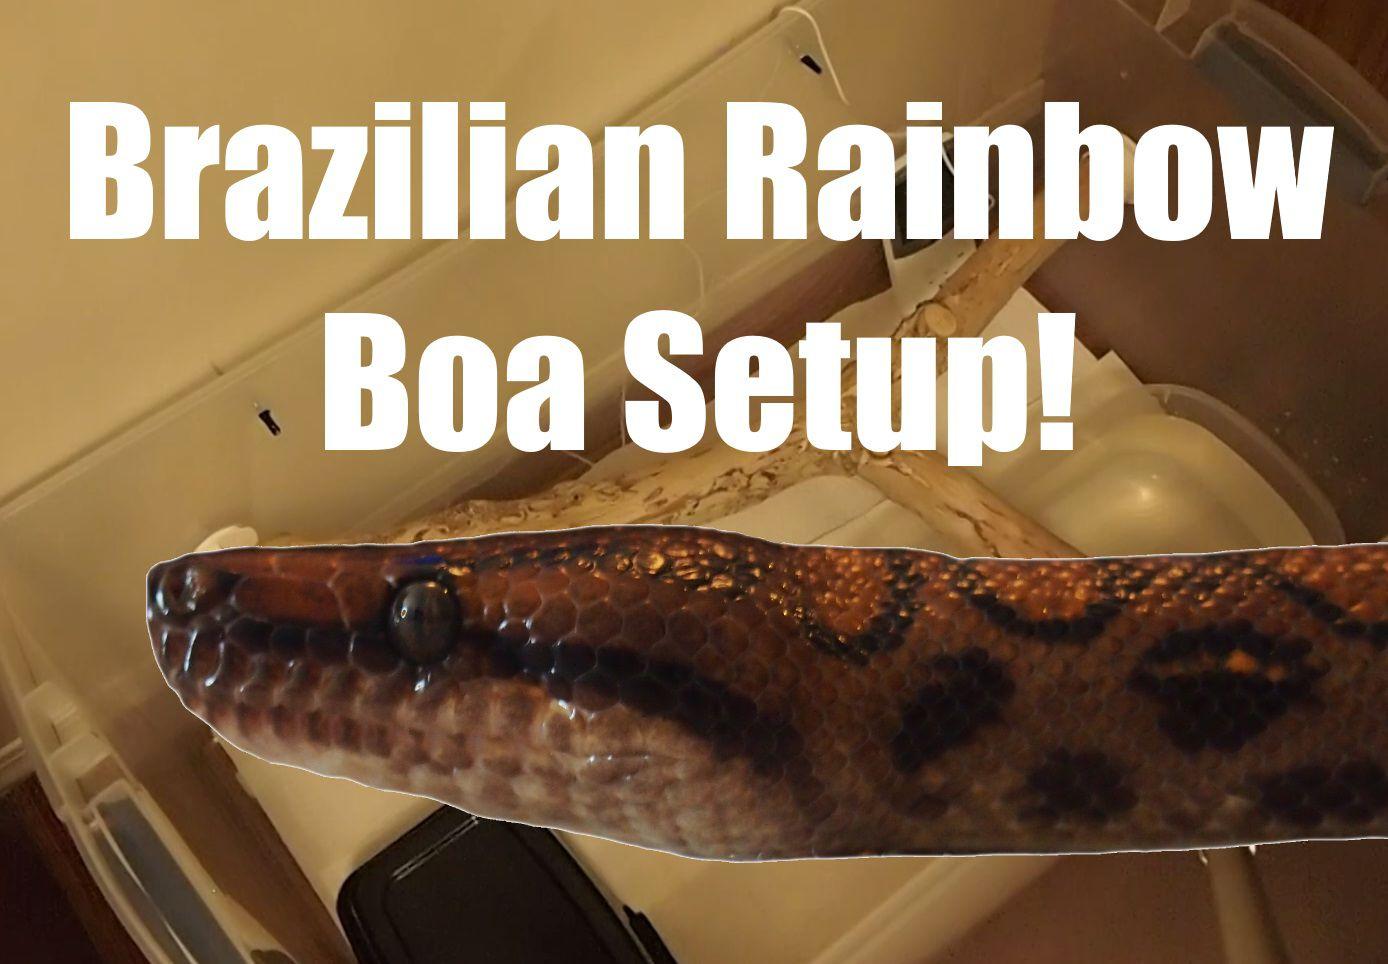 Brazilian Rainbow Boa Cage Setup